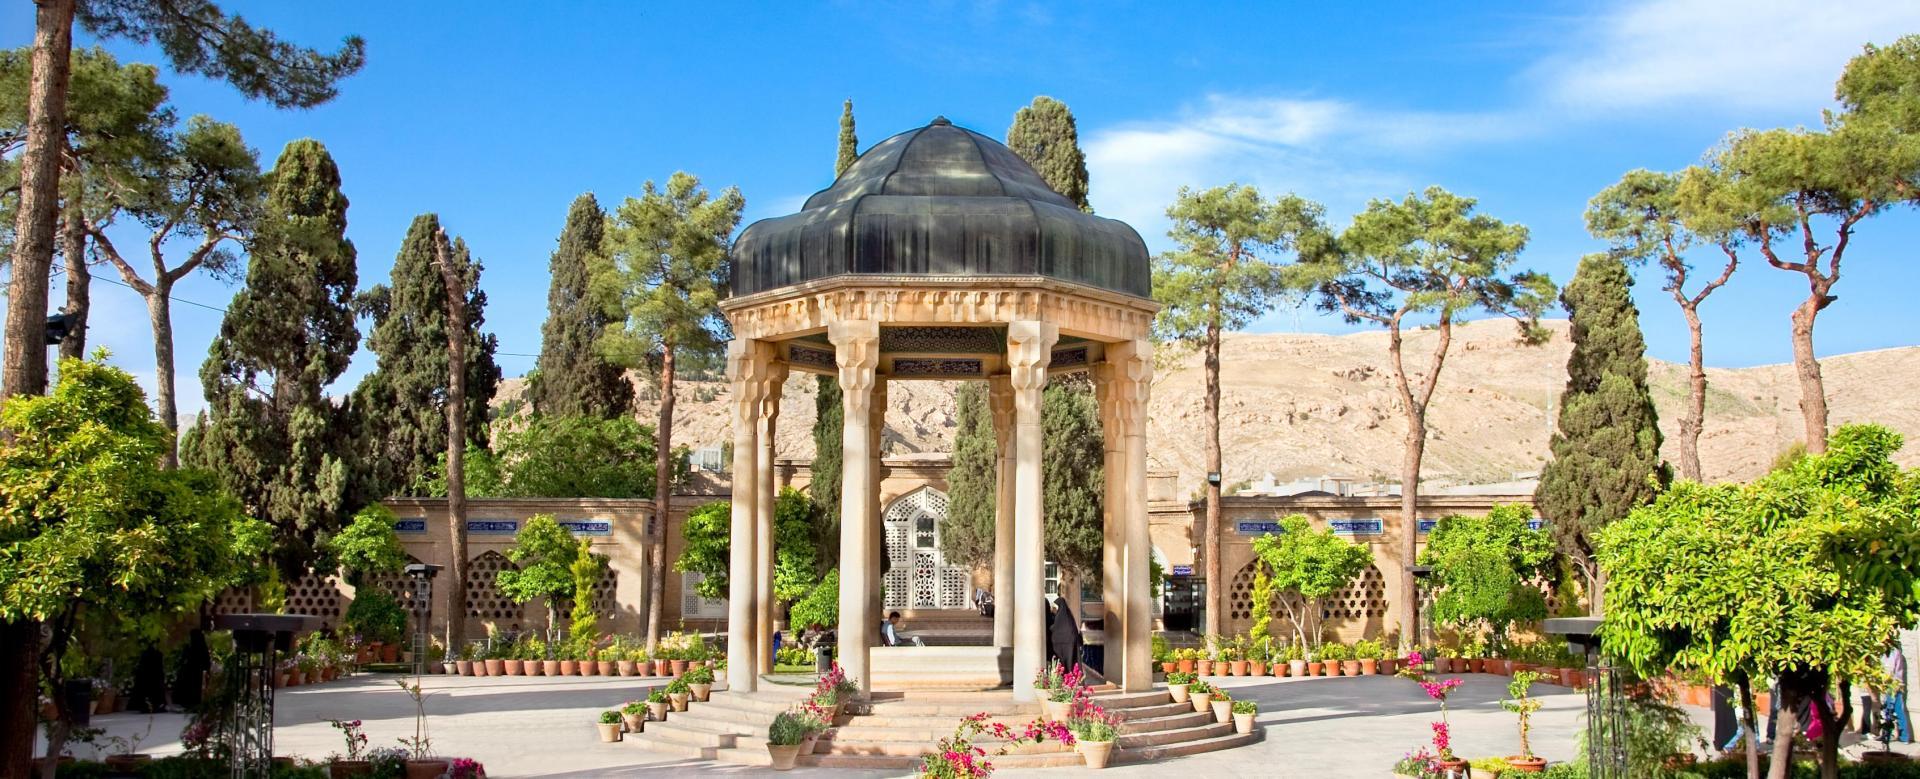 Voyage à pied : Iran, un rêve persan